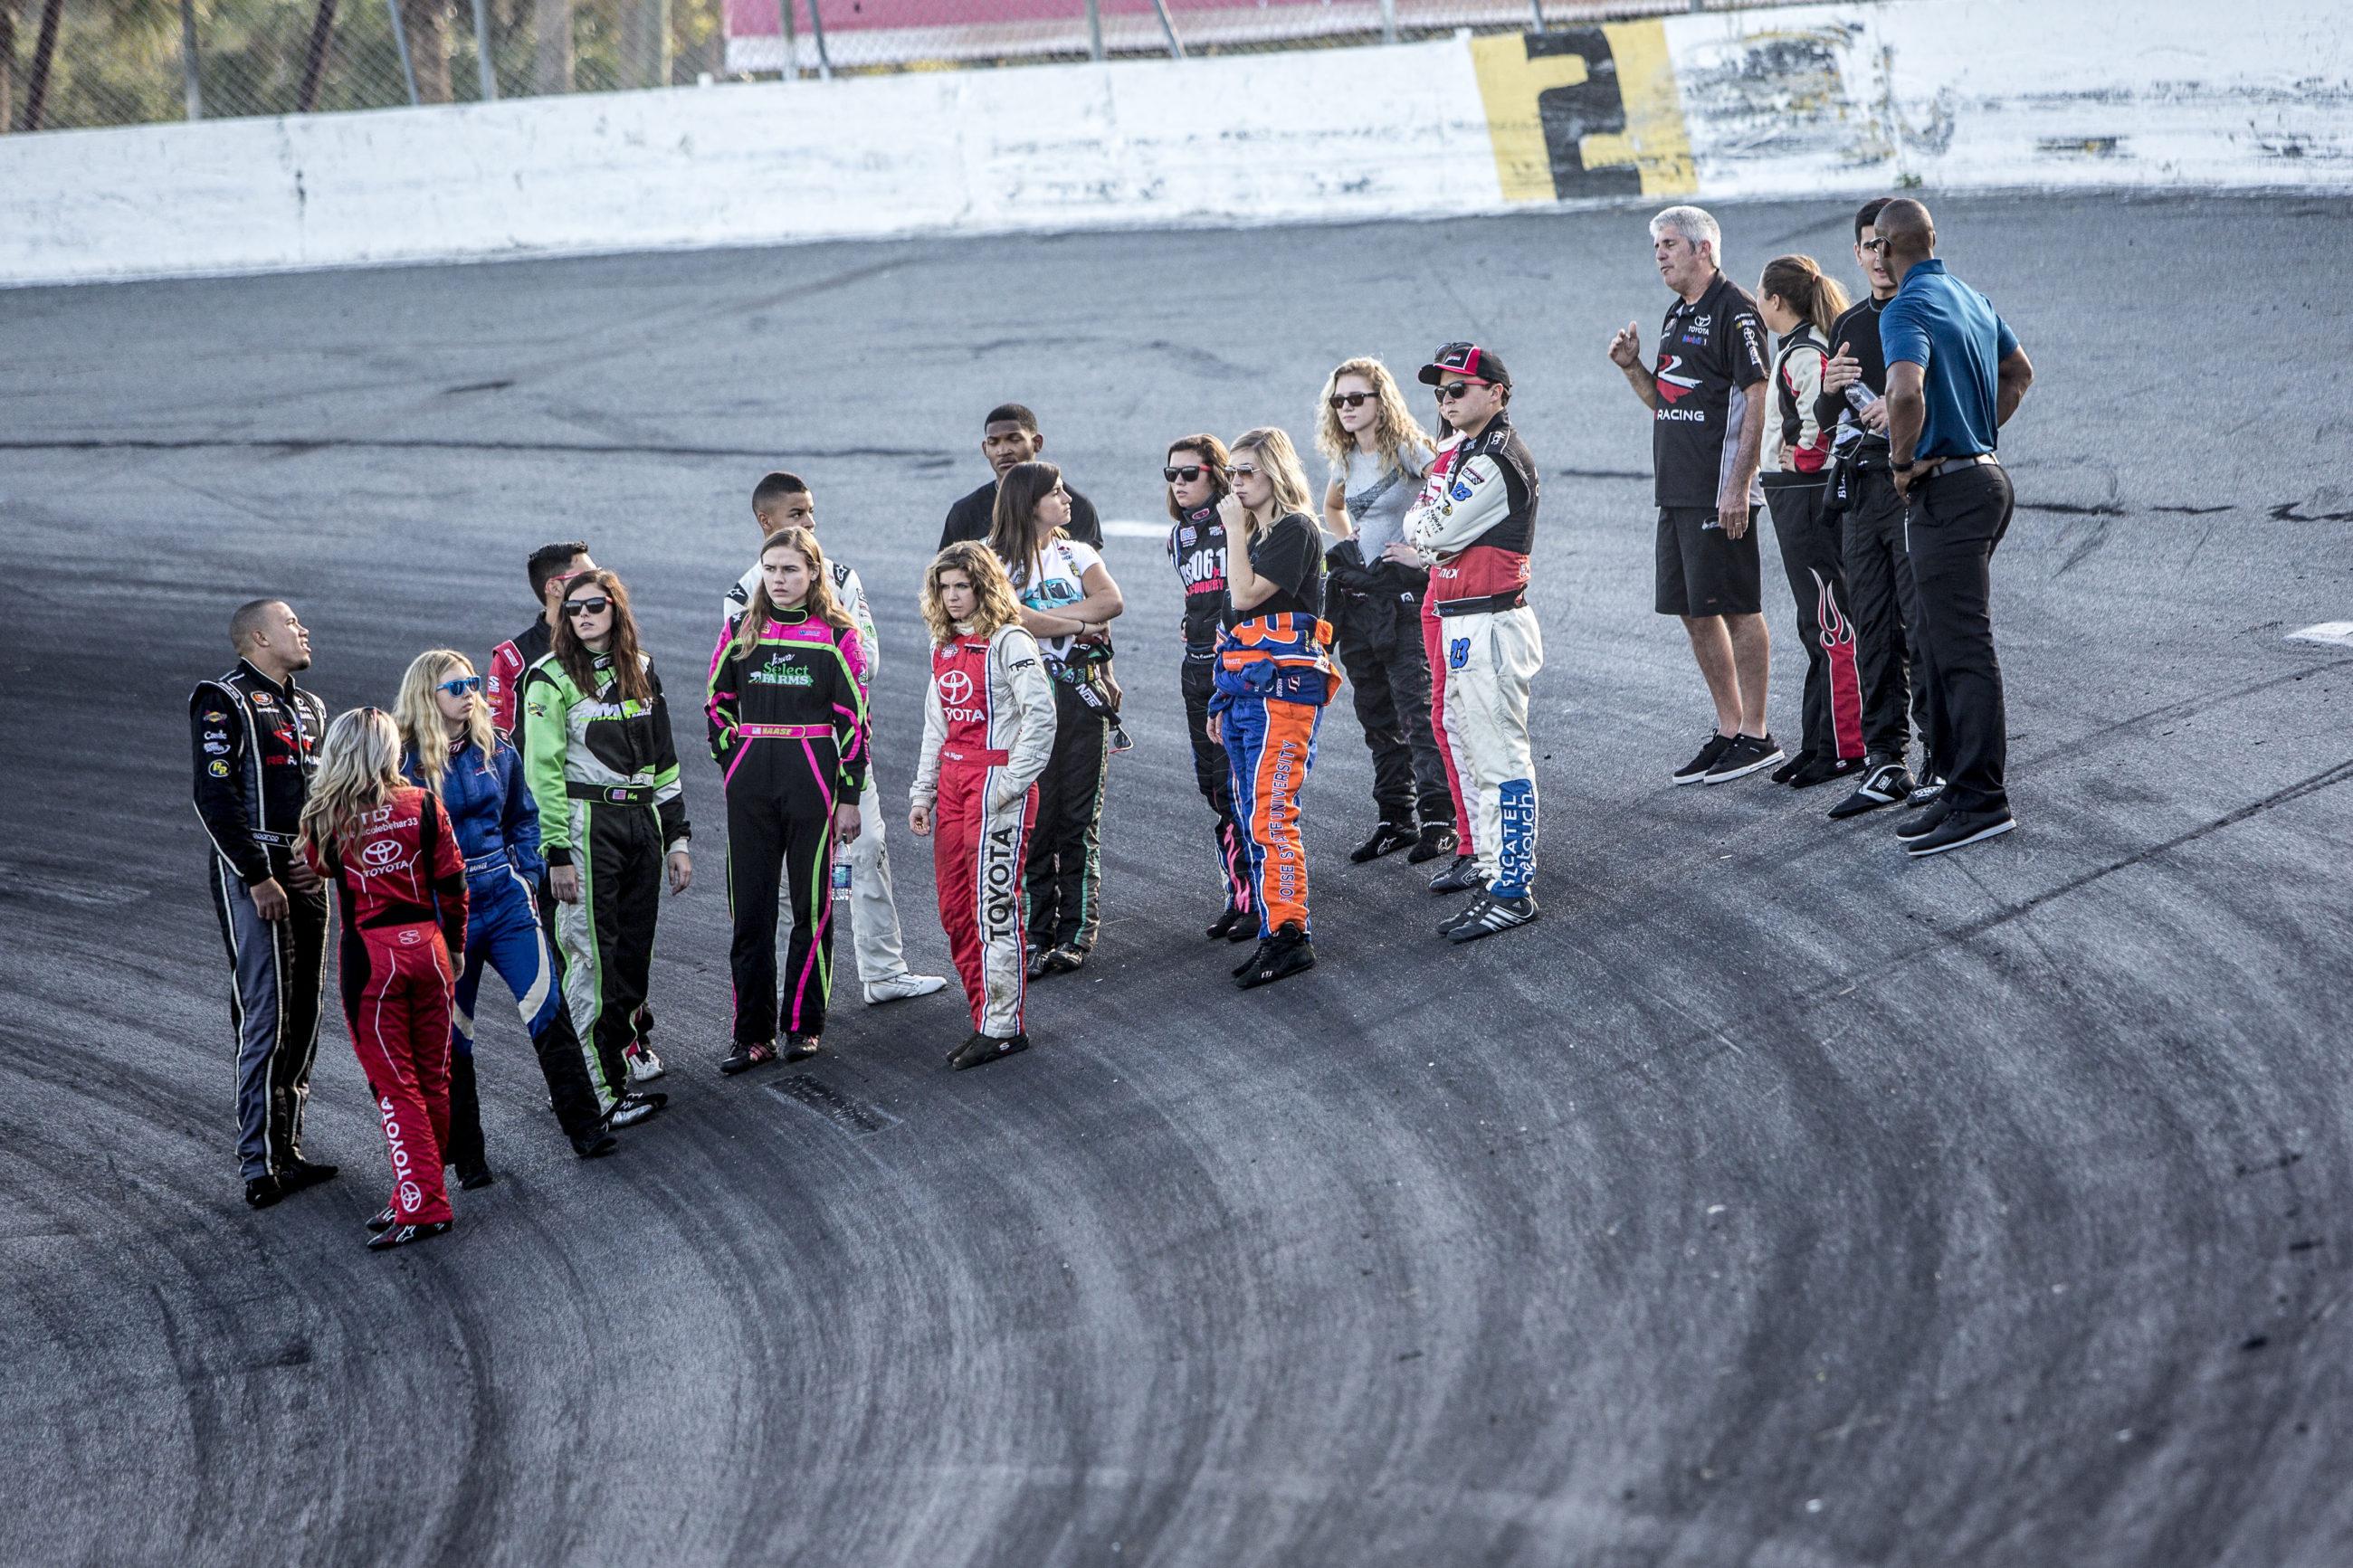 2016 NASCAR Drive for Diversity Drivers - Rachael Frost Winner